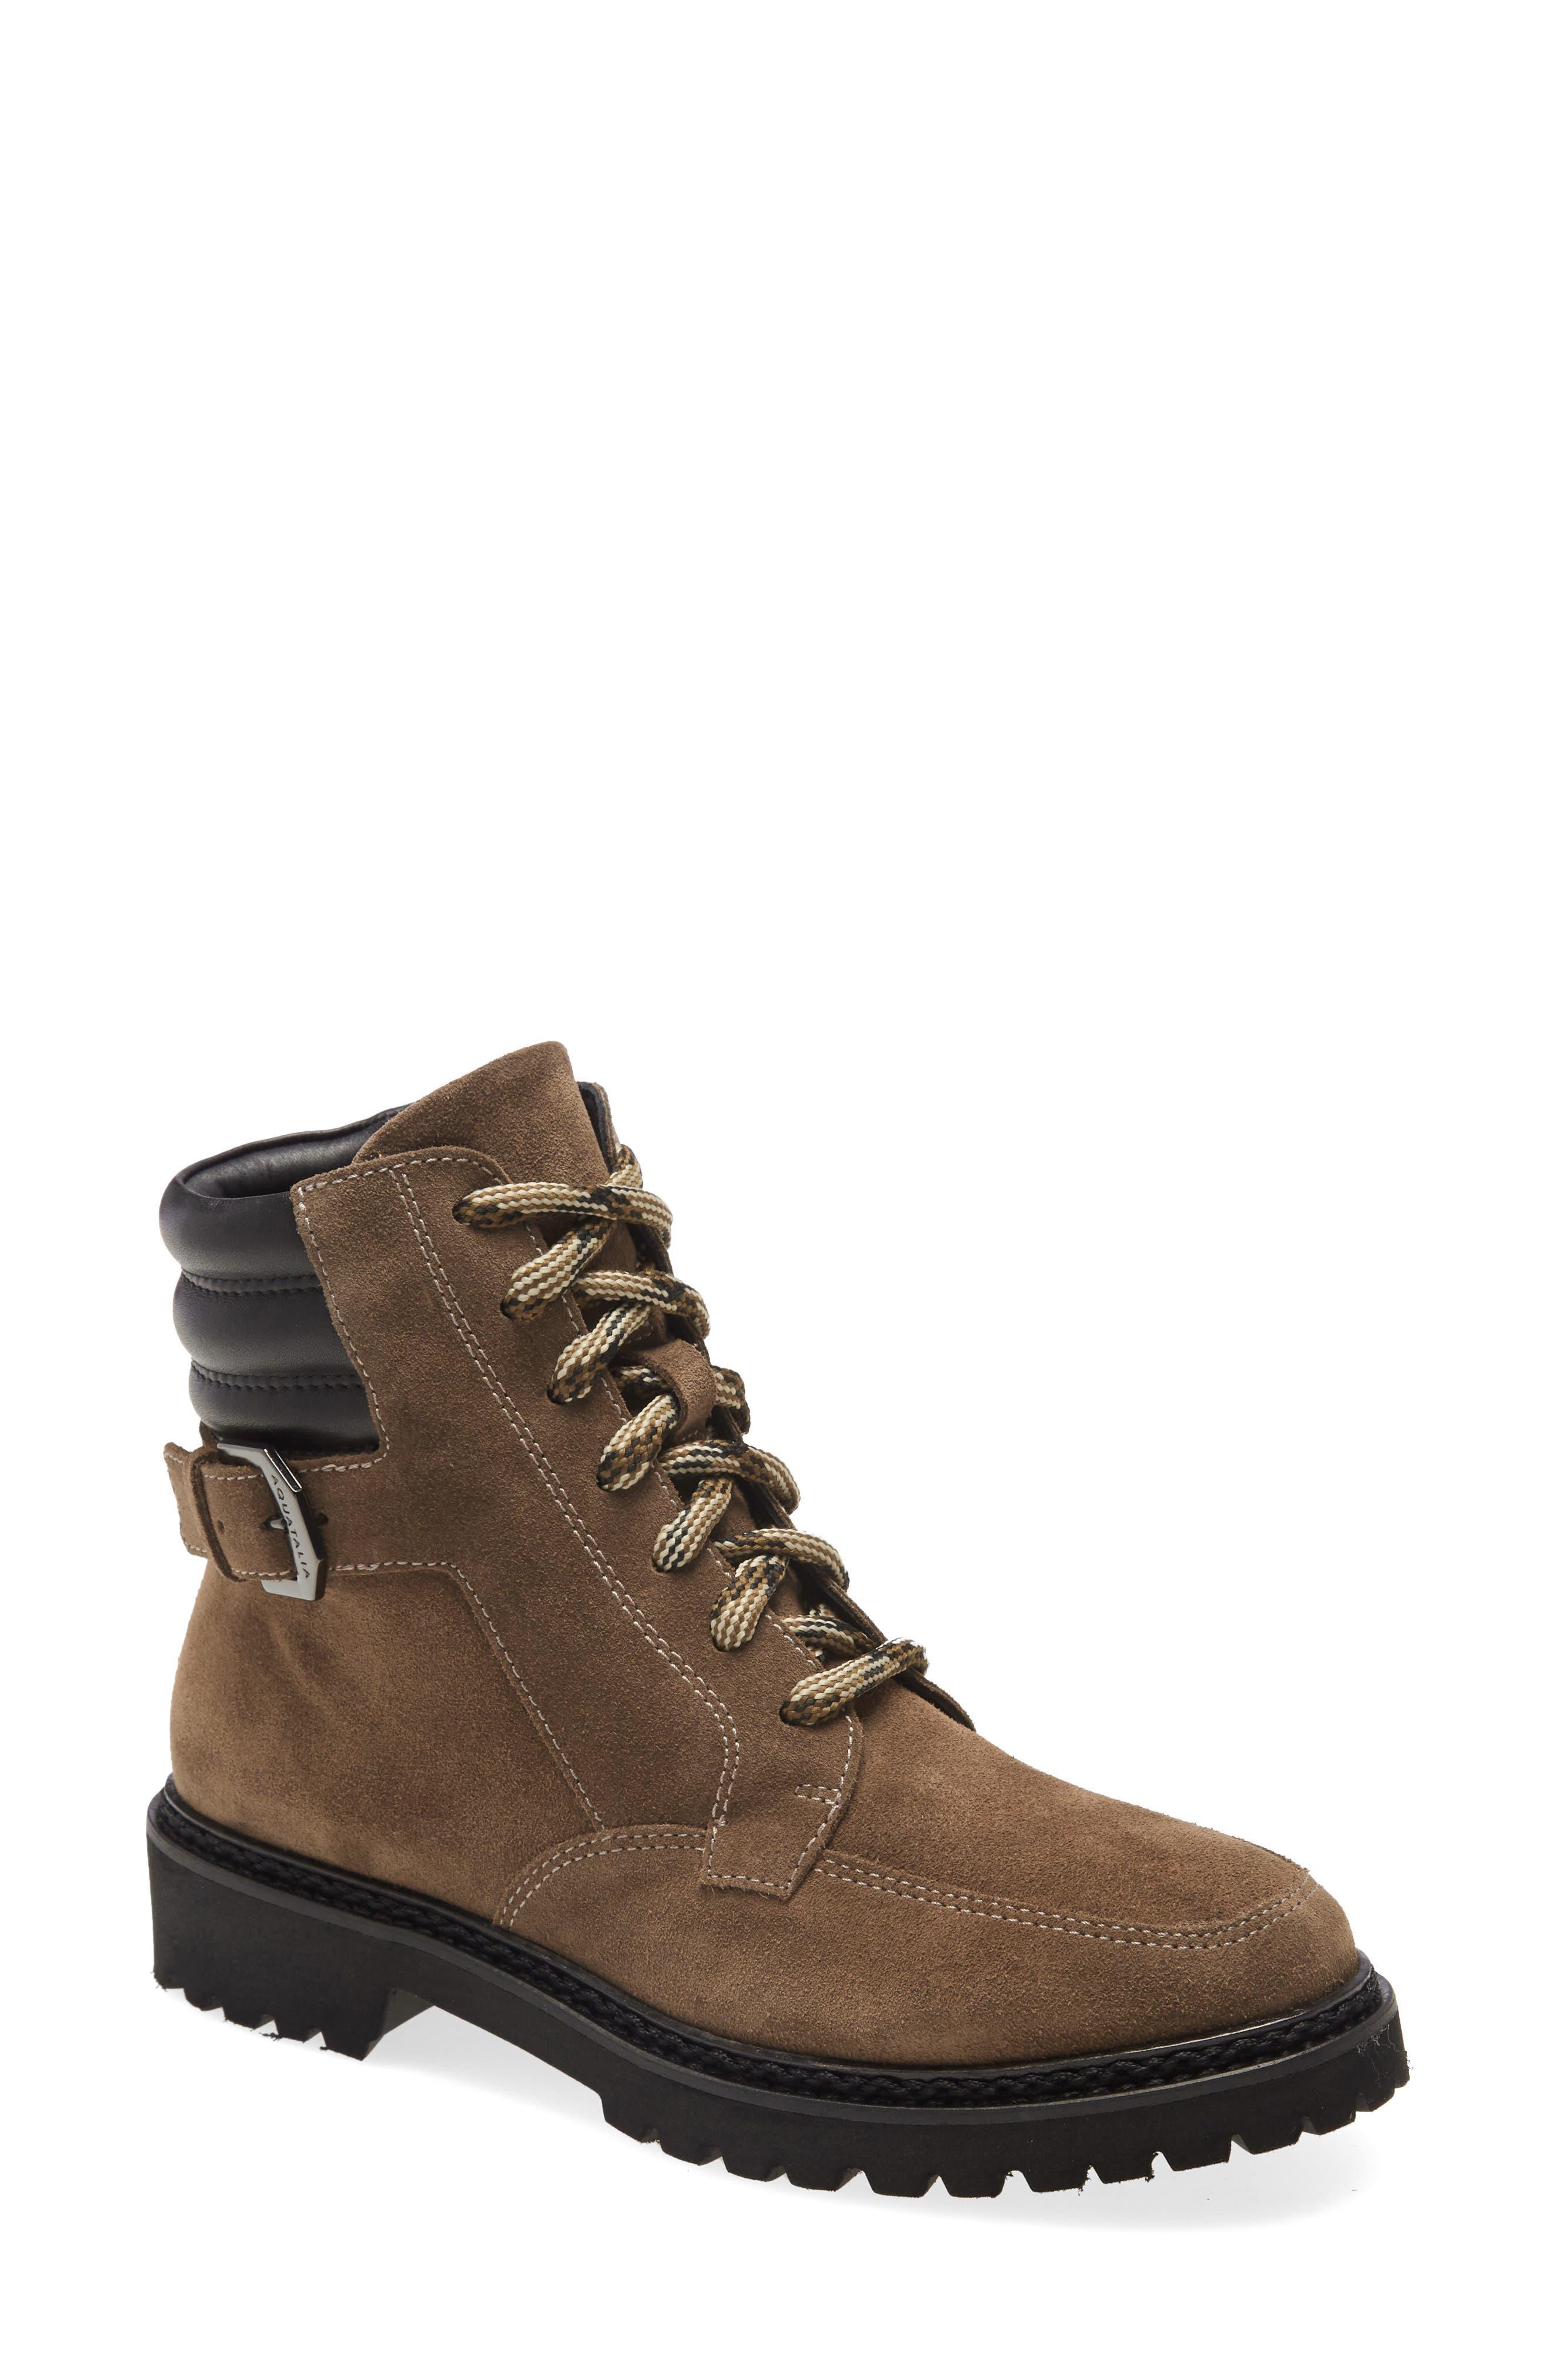 Aquatalia Booties \u0026 Ankle Boots   Nordstrom